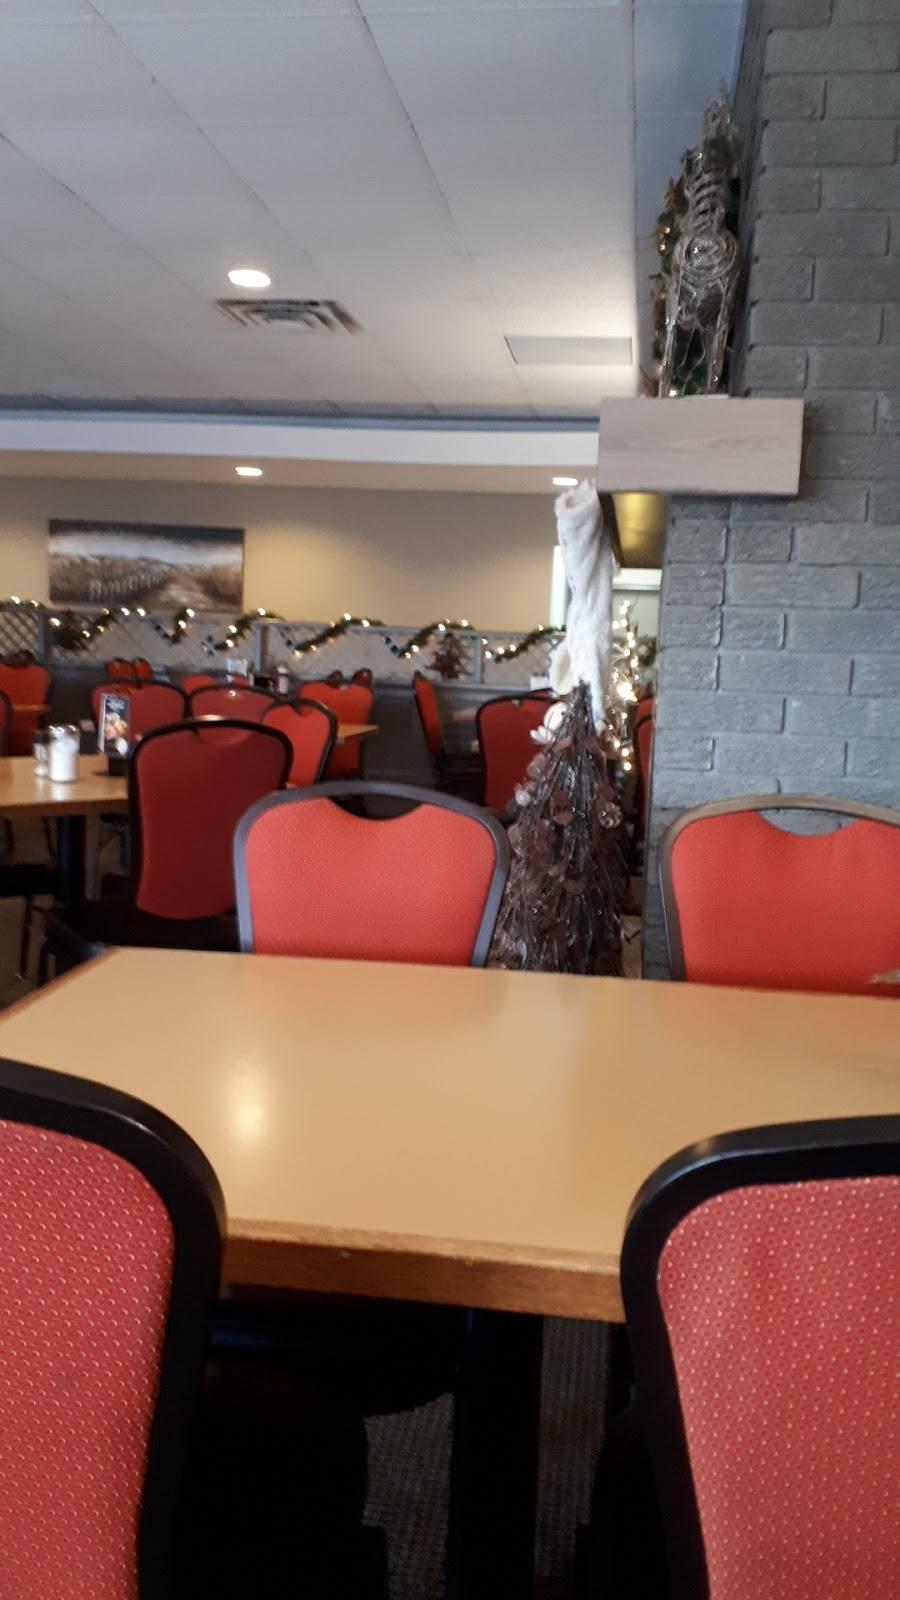 Country Hearth Family Restaurant | restaurant | 9952 Glendon Dr, Komoka, ON N0L 1R0, Canada | 5196577605 OR +1 519-657-7605